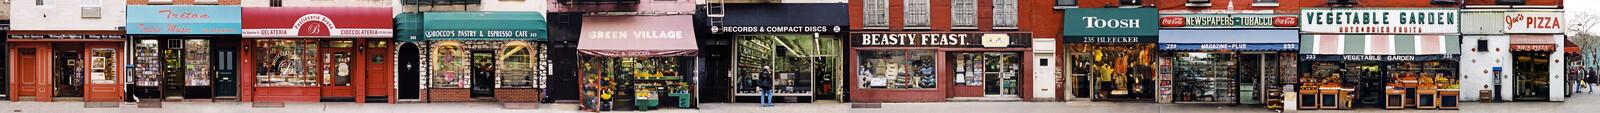 Bleecker St. b/t Leroy & Carmine, Greenwich Village - James & Karla Murray